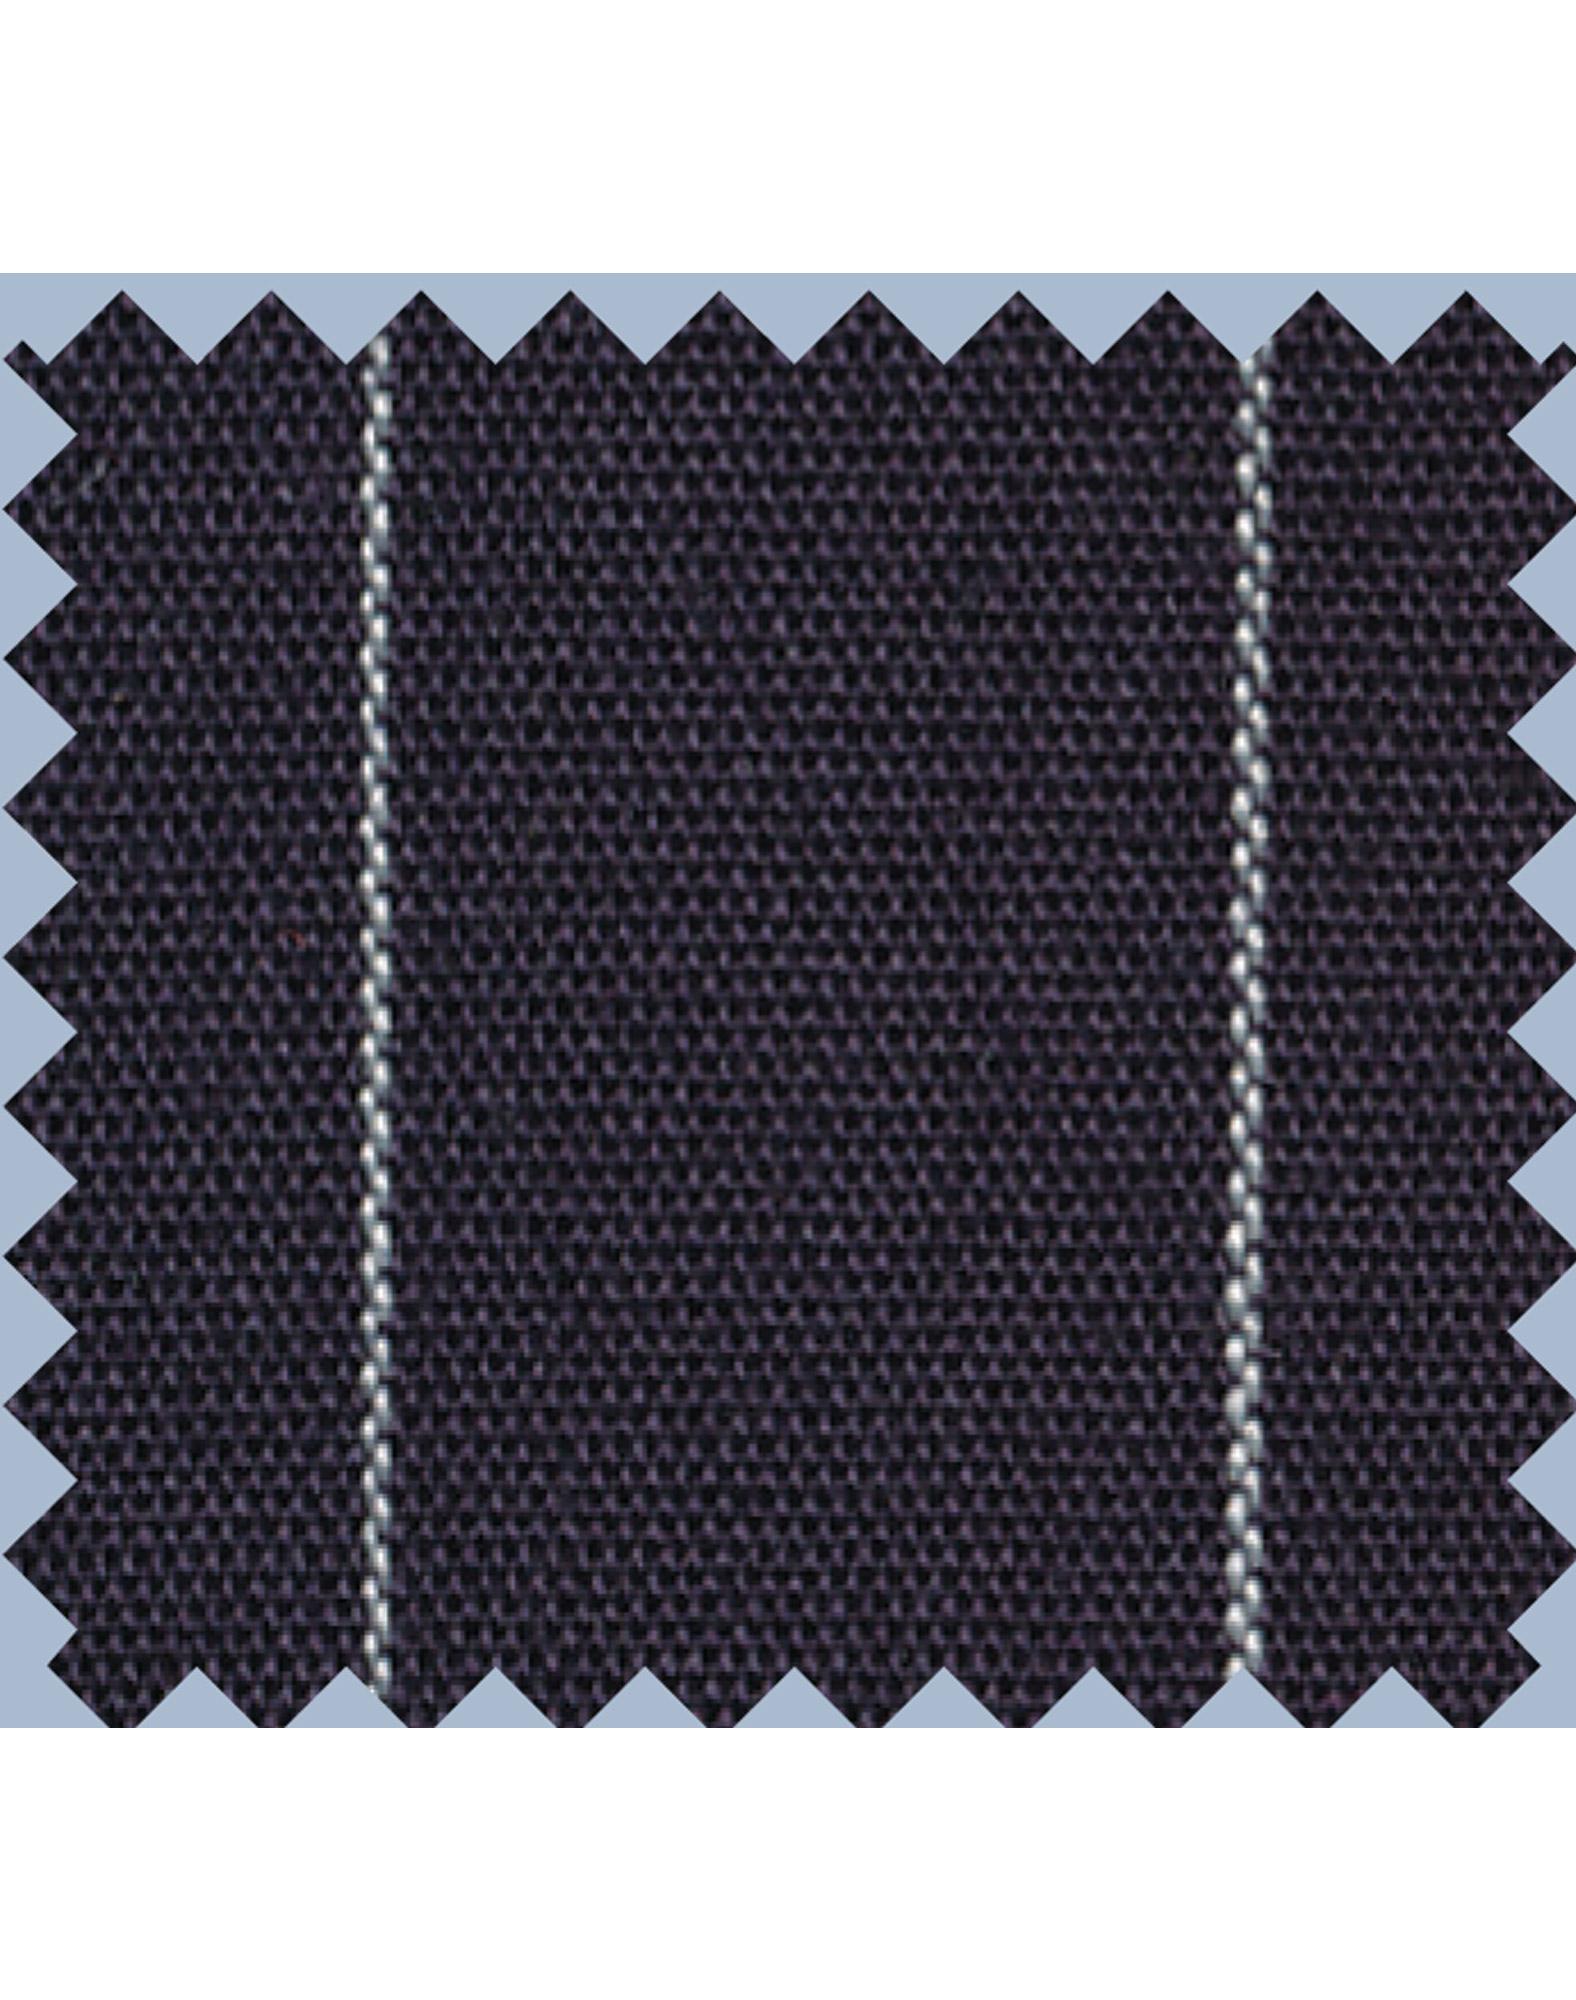 https://s3-ap-southeast-1.amazonaws.com/ws-imgs/BENCHMARK/M8223_Navy.White_fabric.jpg